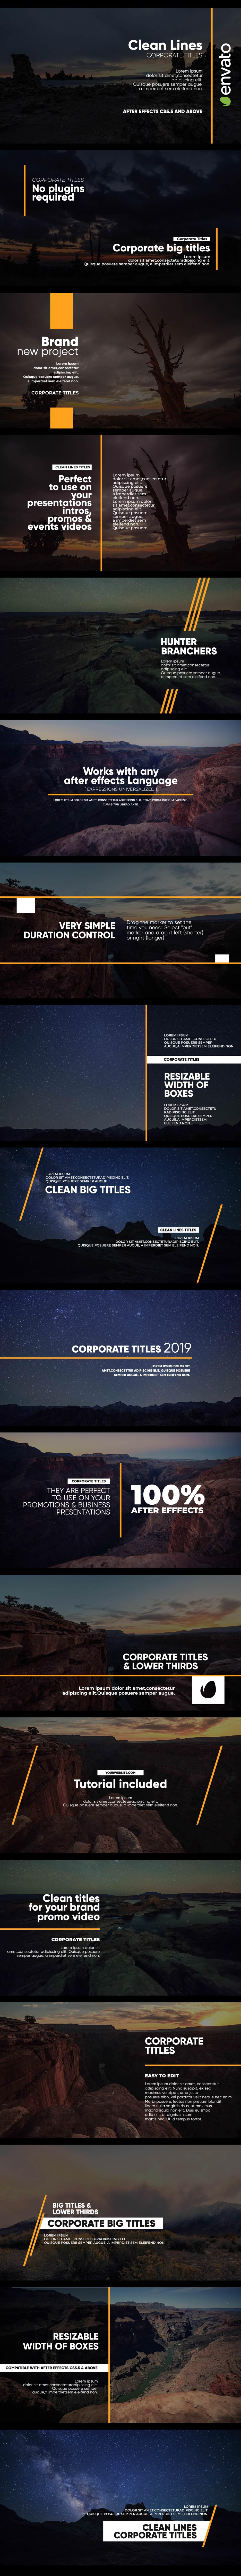 Clean Lines - Big Titles - 1